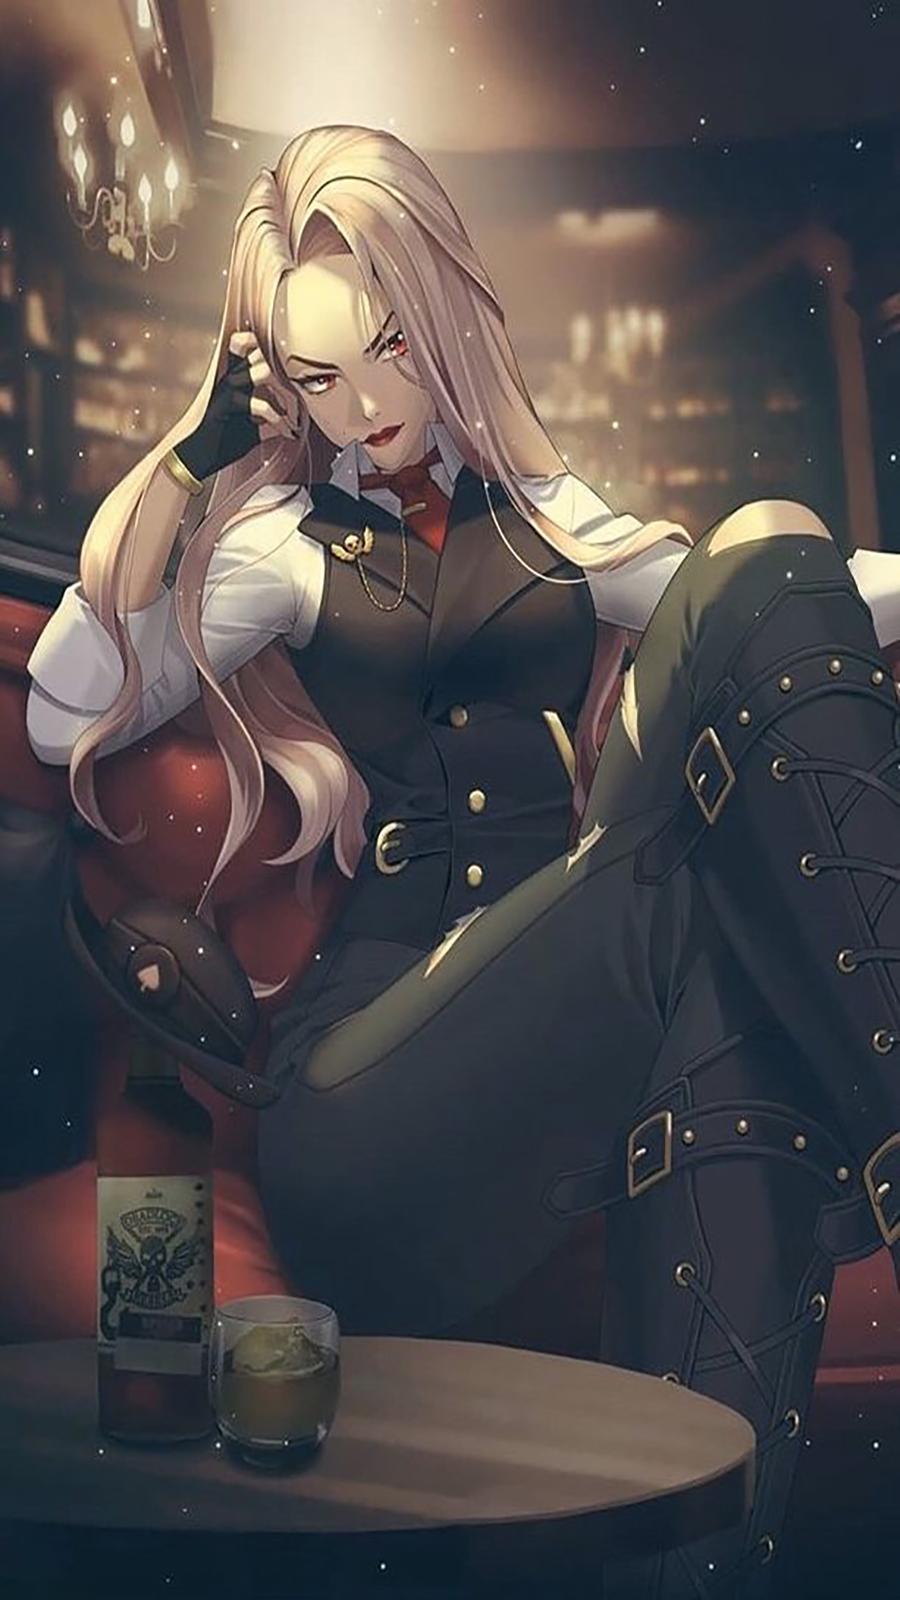 Anime Criminal Girl Wallpapers Download